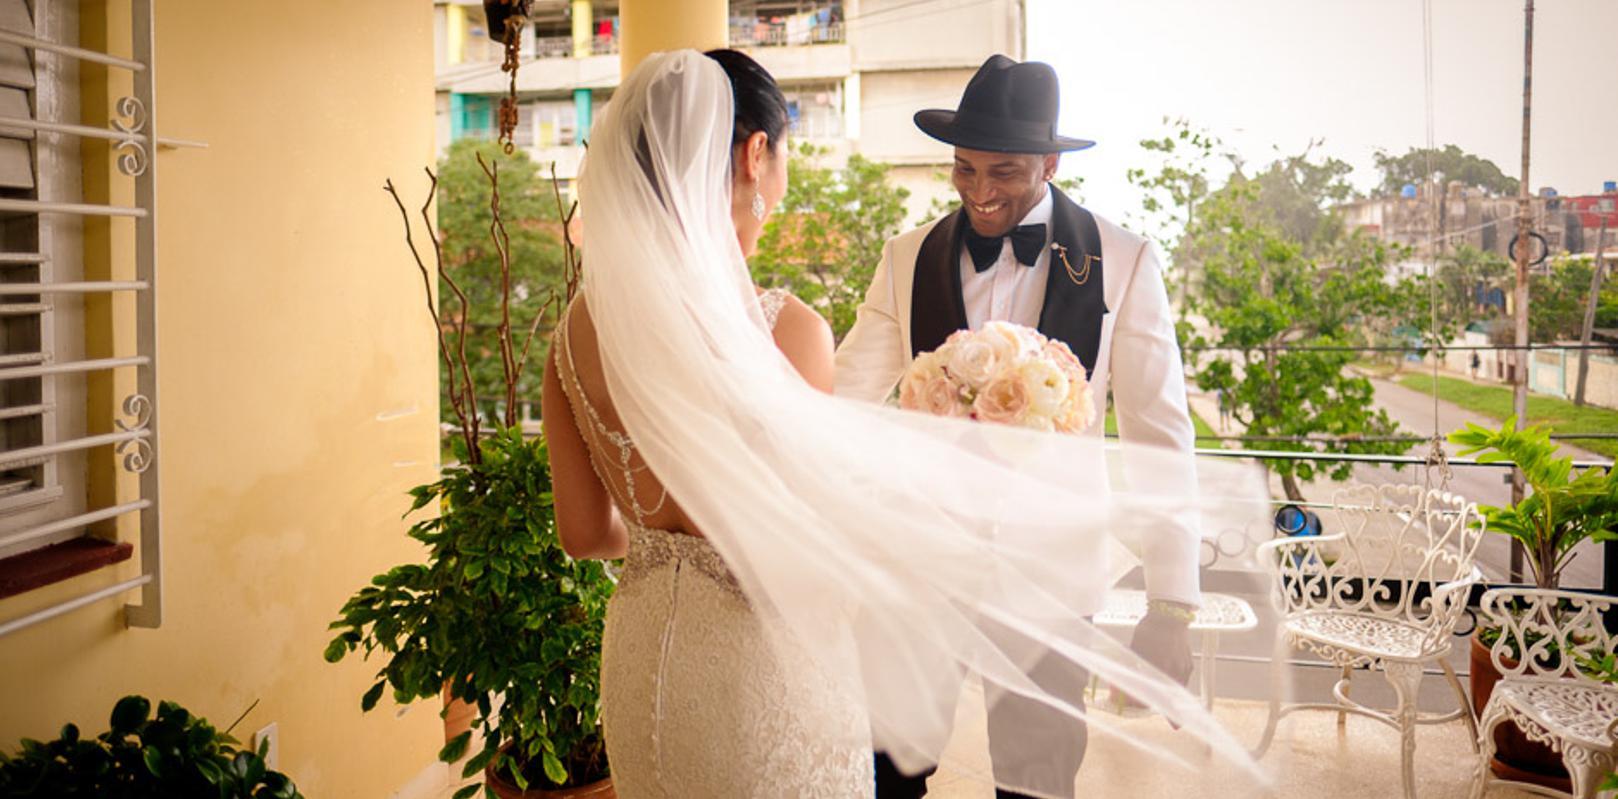 bodas-sin-clasificar-sin-tema-cuba-41092.jpg